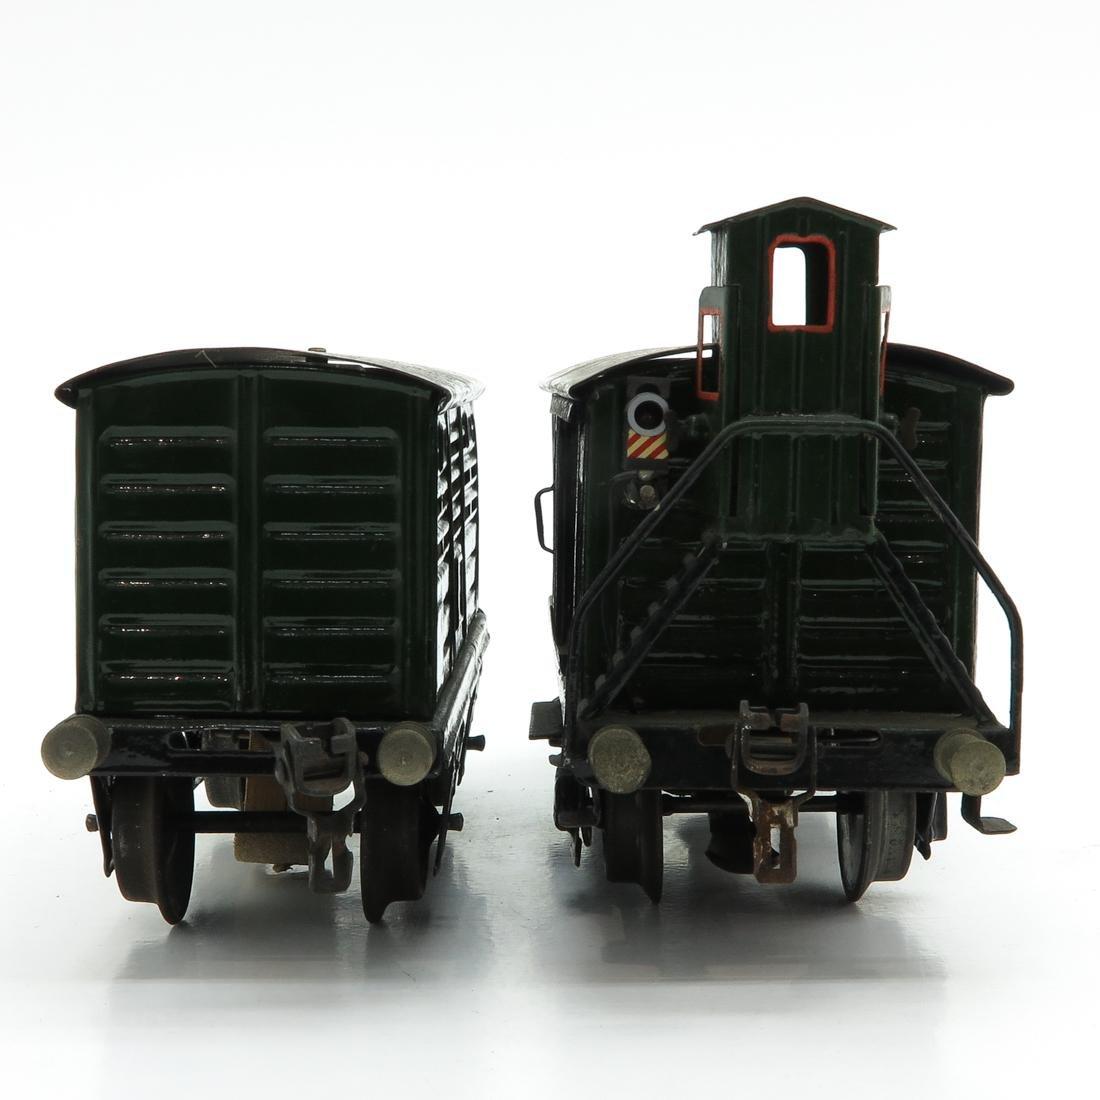 Lot of 2 Vintage Marklin Train Cars - 2